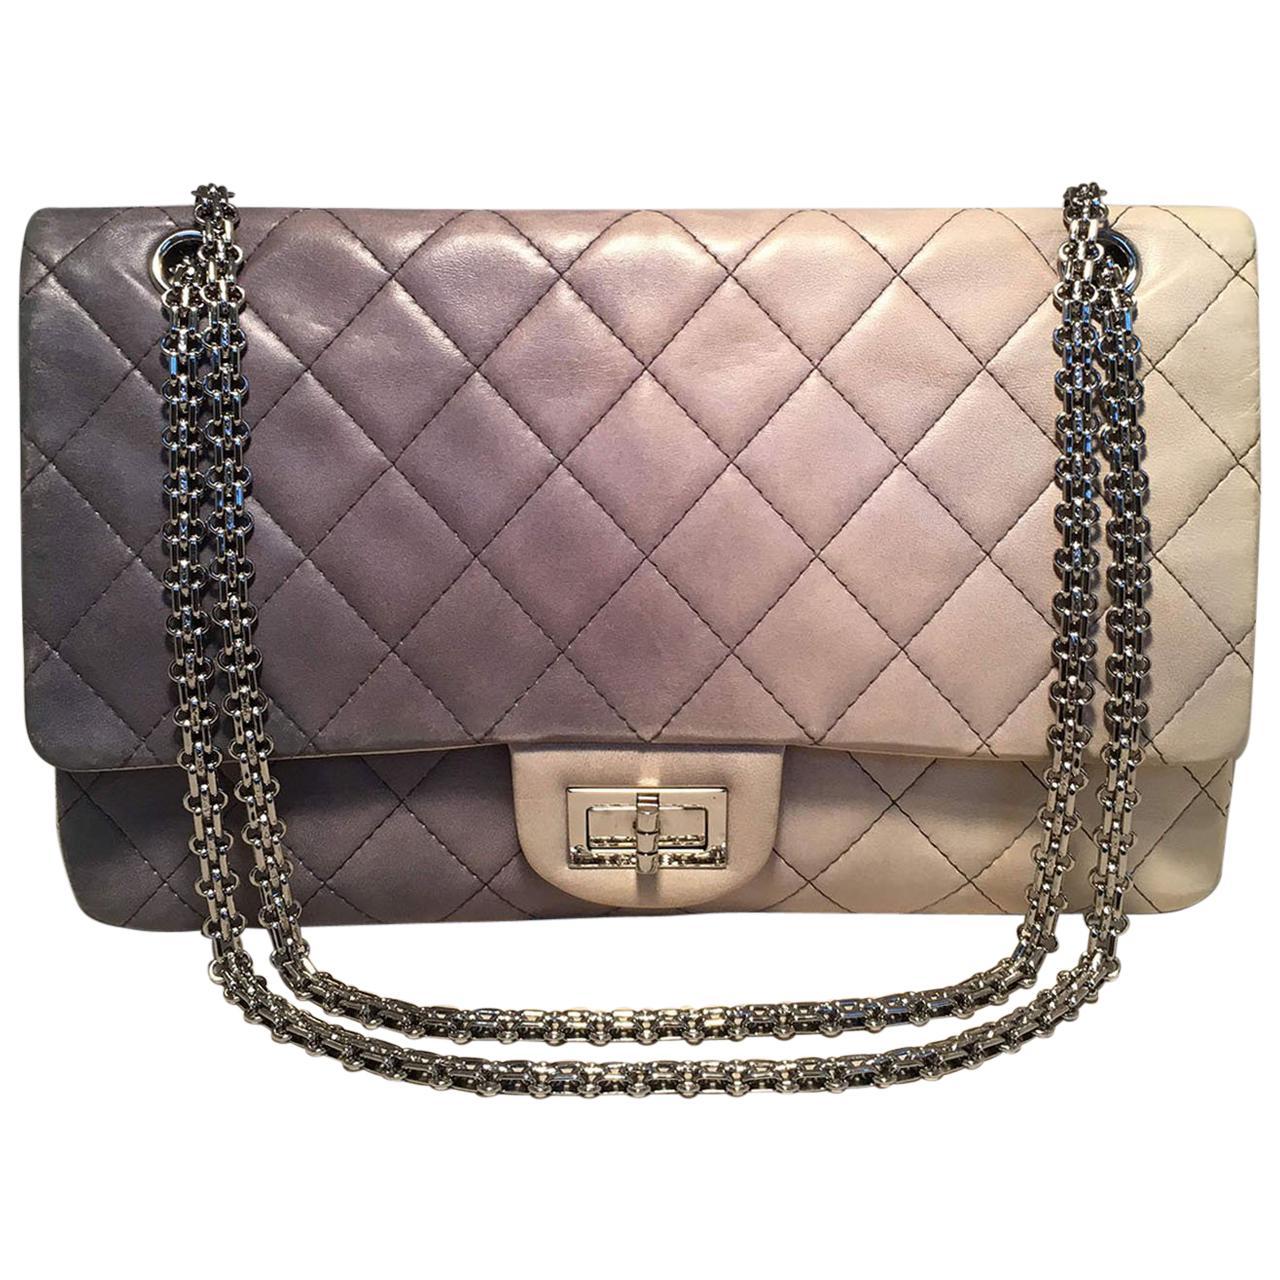 e9225fec17e Ladybag International Shoulder Bags - 1stdibs